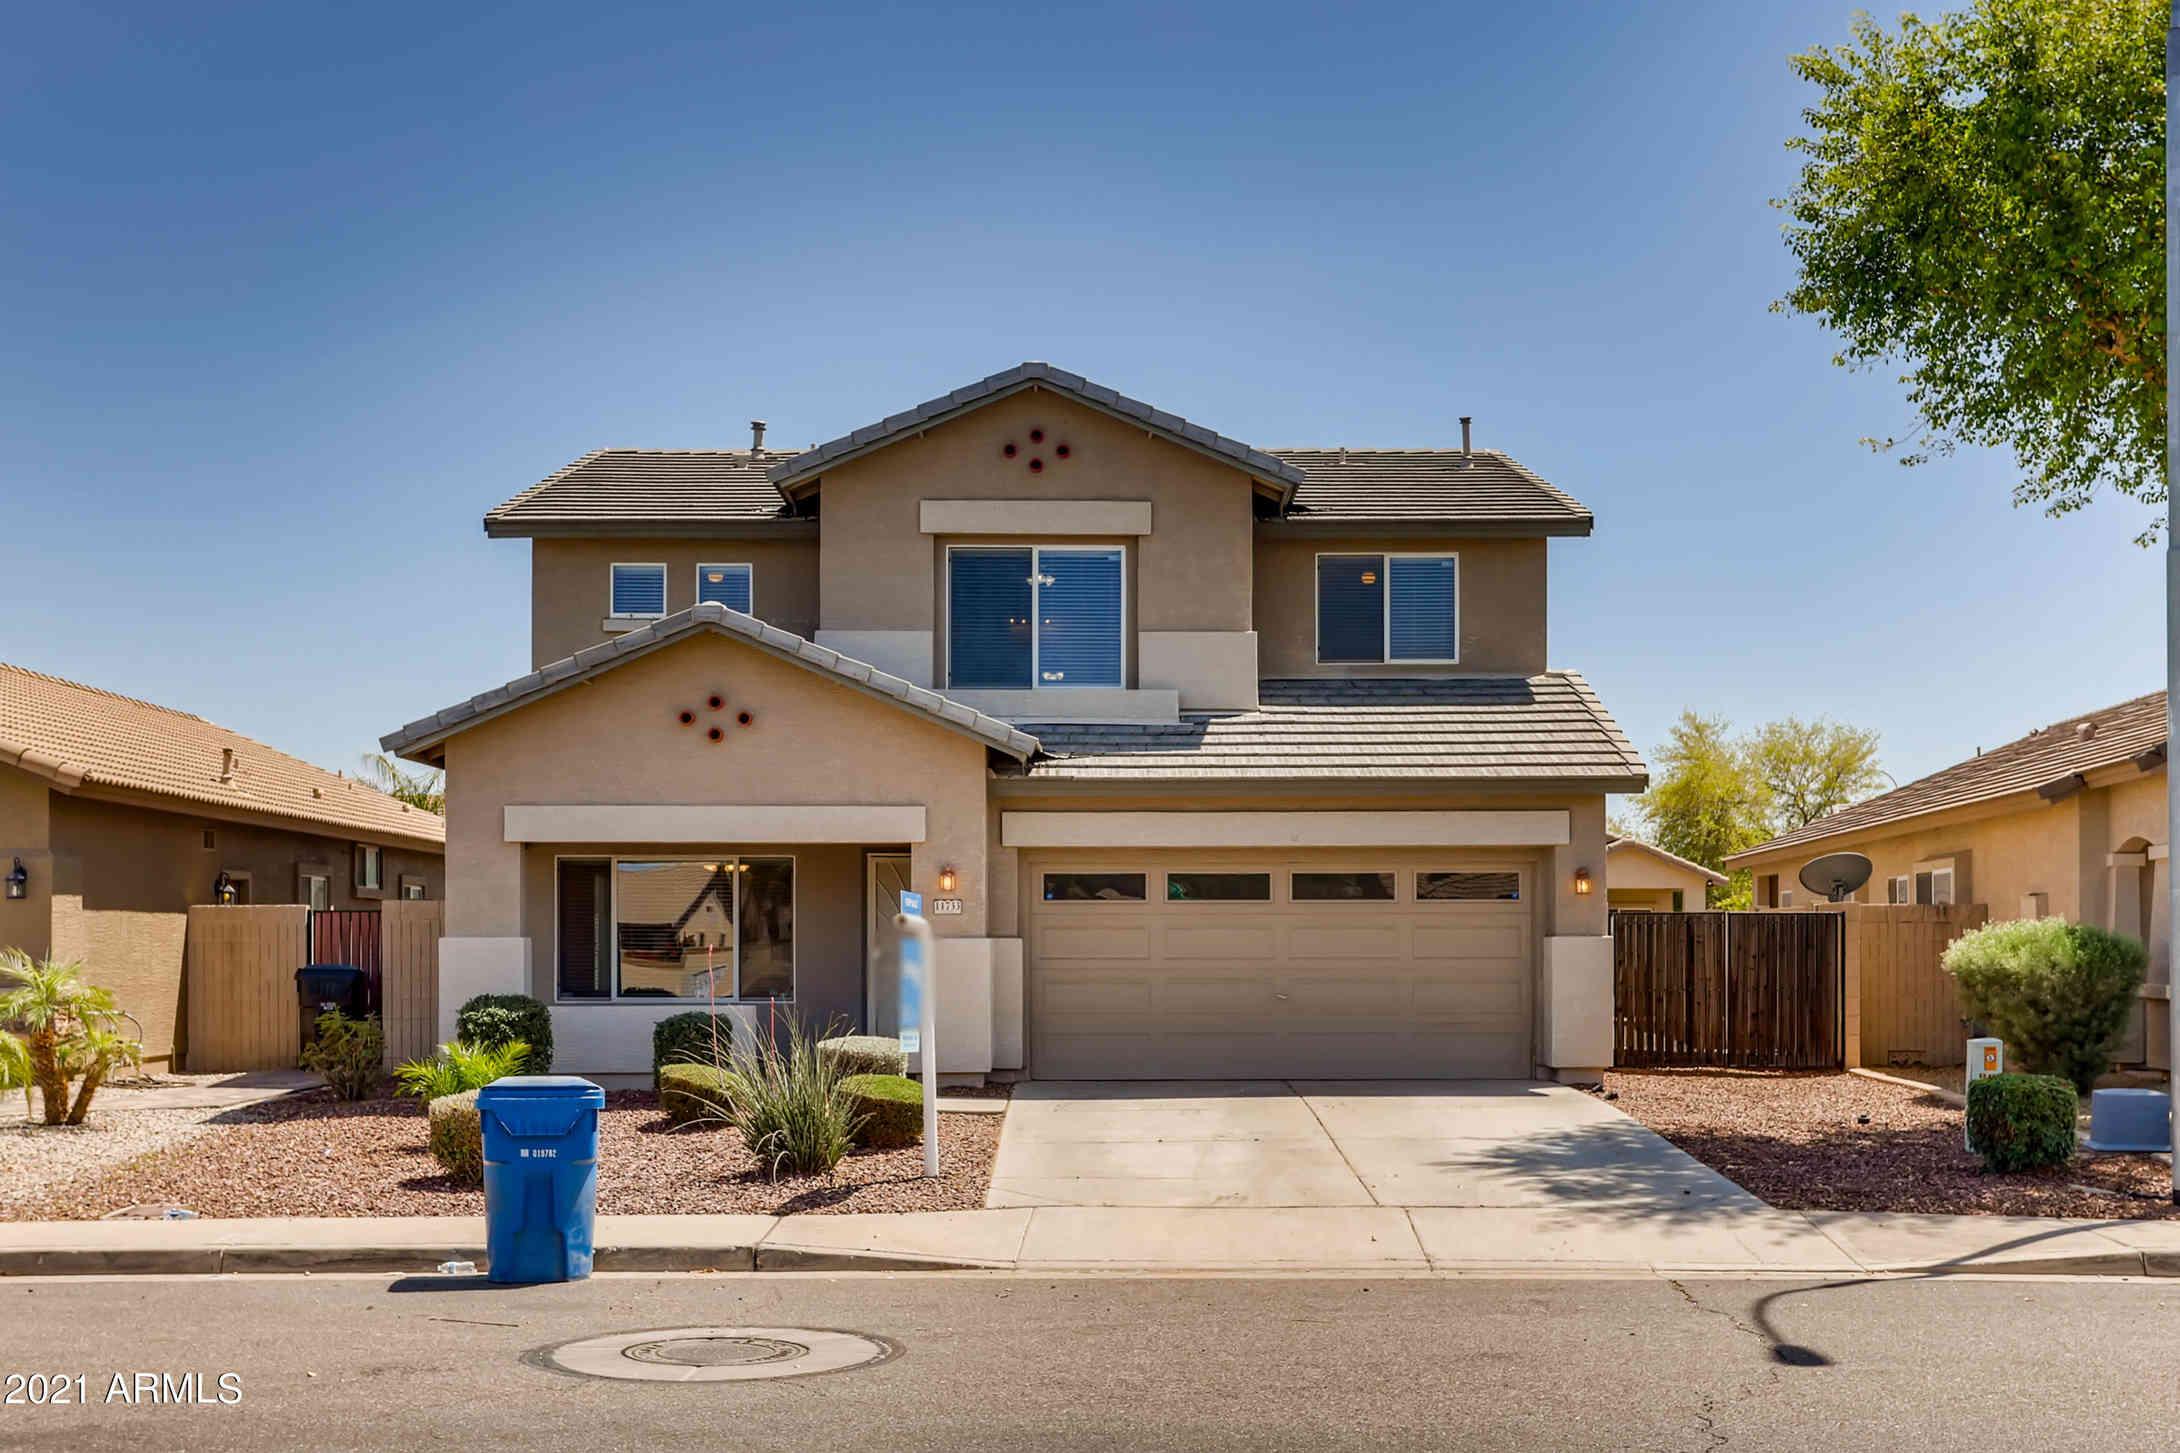 11733 W MADISON Street, Avondale, AZ, 85323,